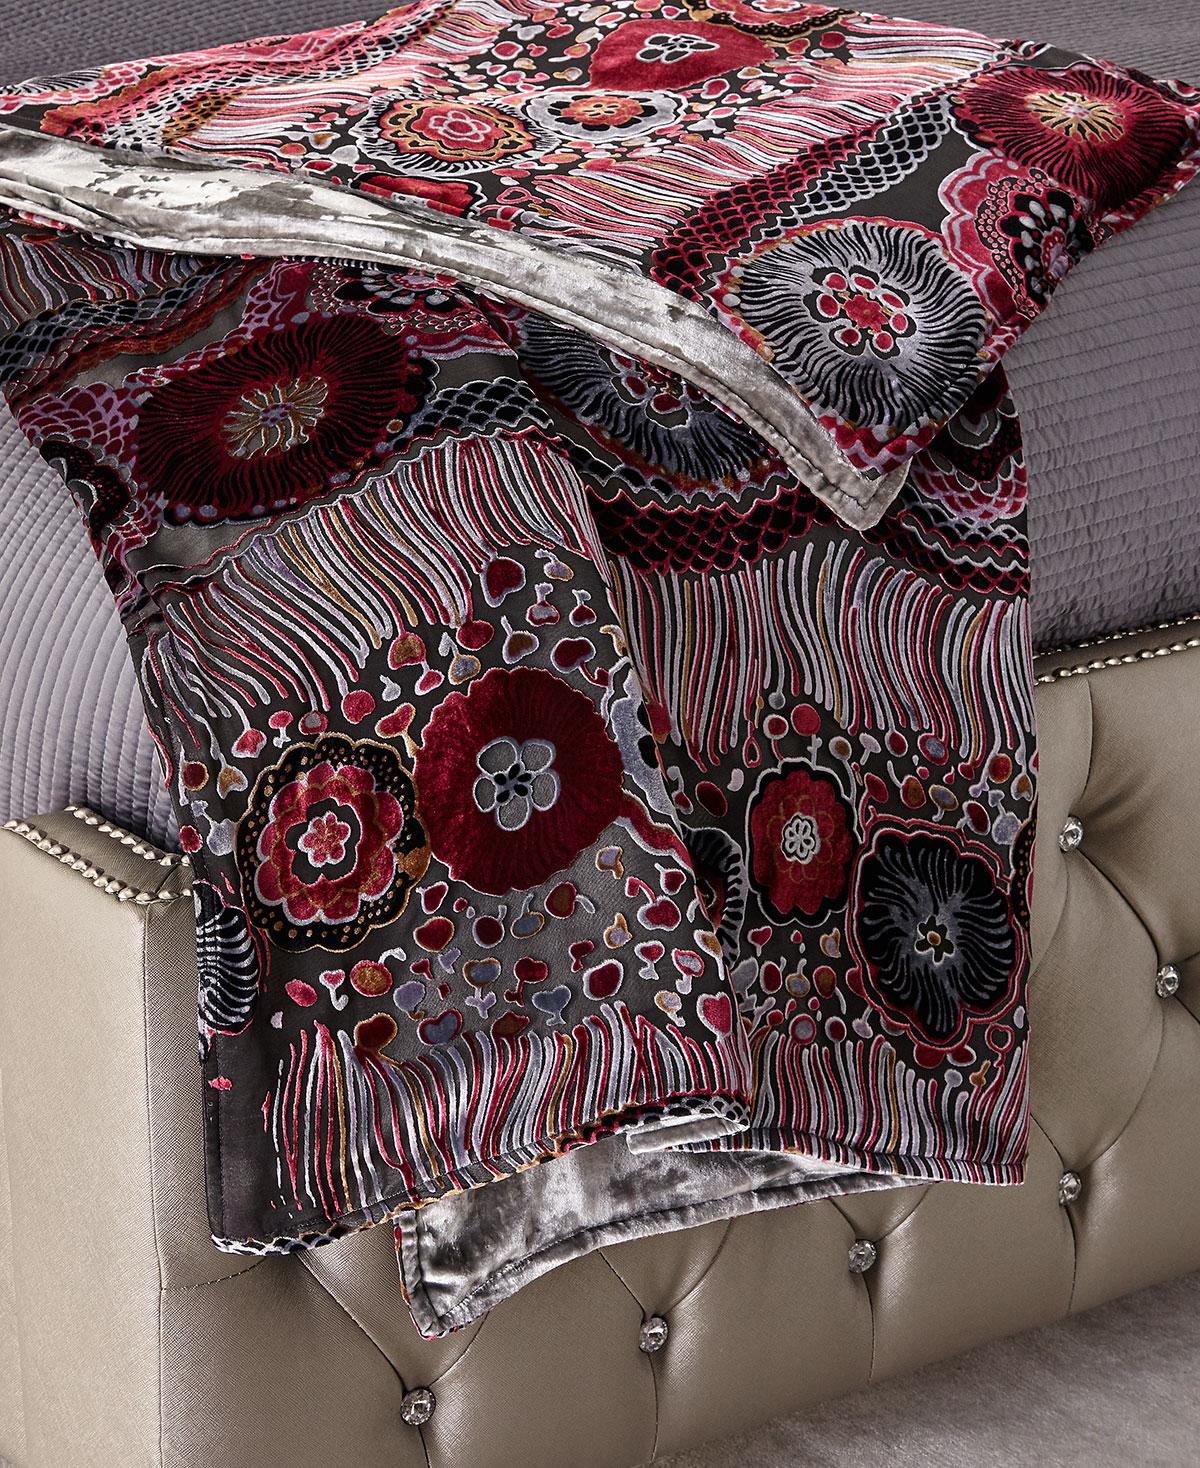 Natasha Throw Blanket, 50